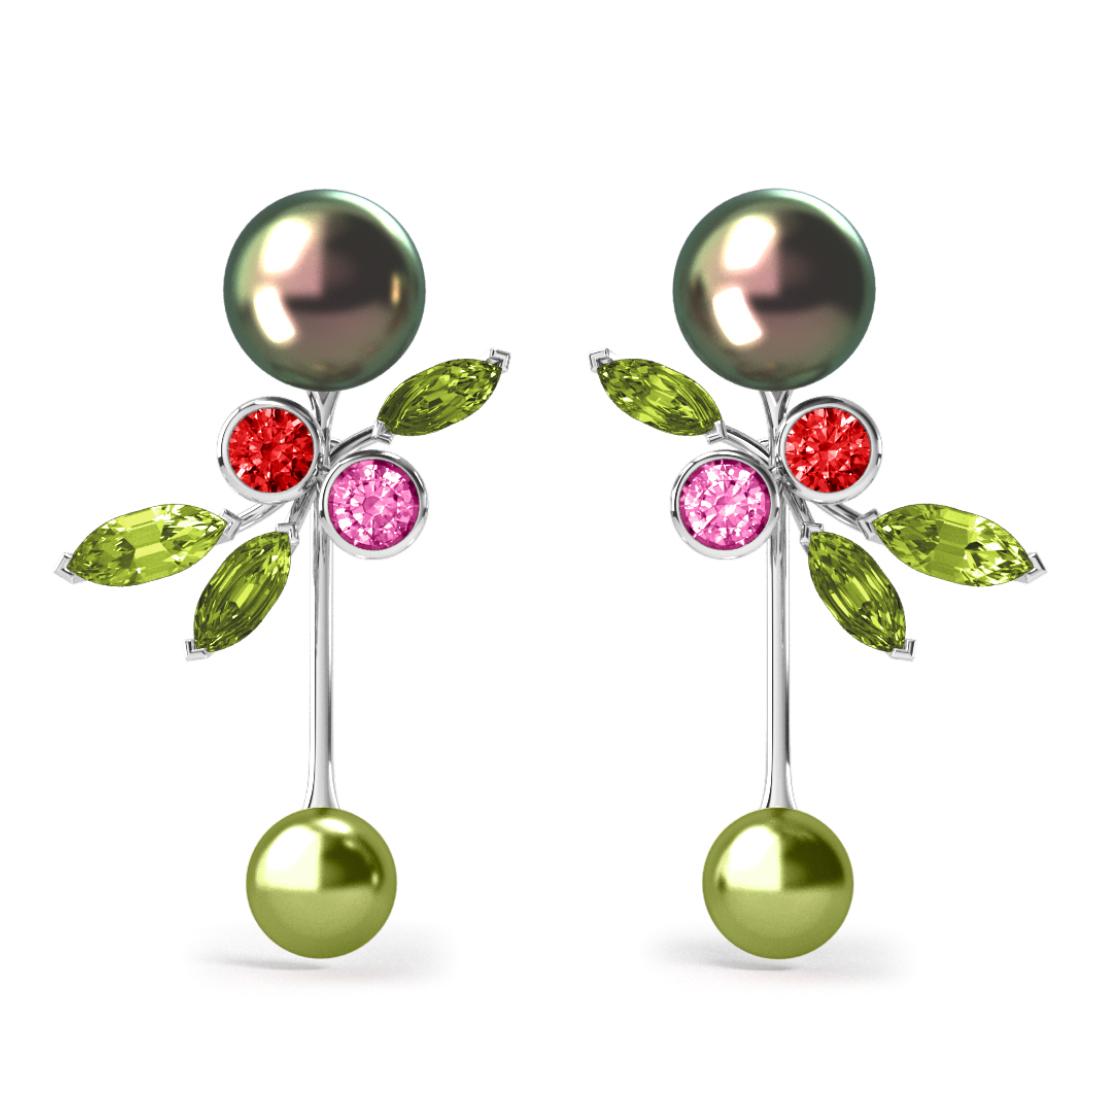 Boucles d'oreilles Pearly Angel Peacock & Pistache - Saphirs, diamants, peridots & perles de Tahiti <br /> Or blanc 18 carats